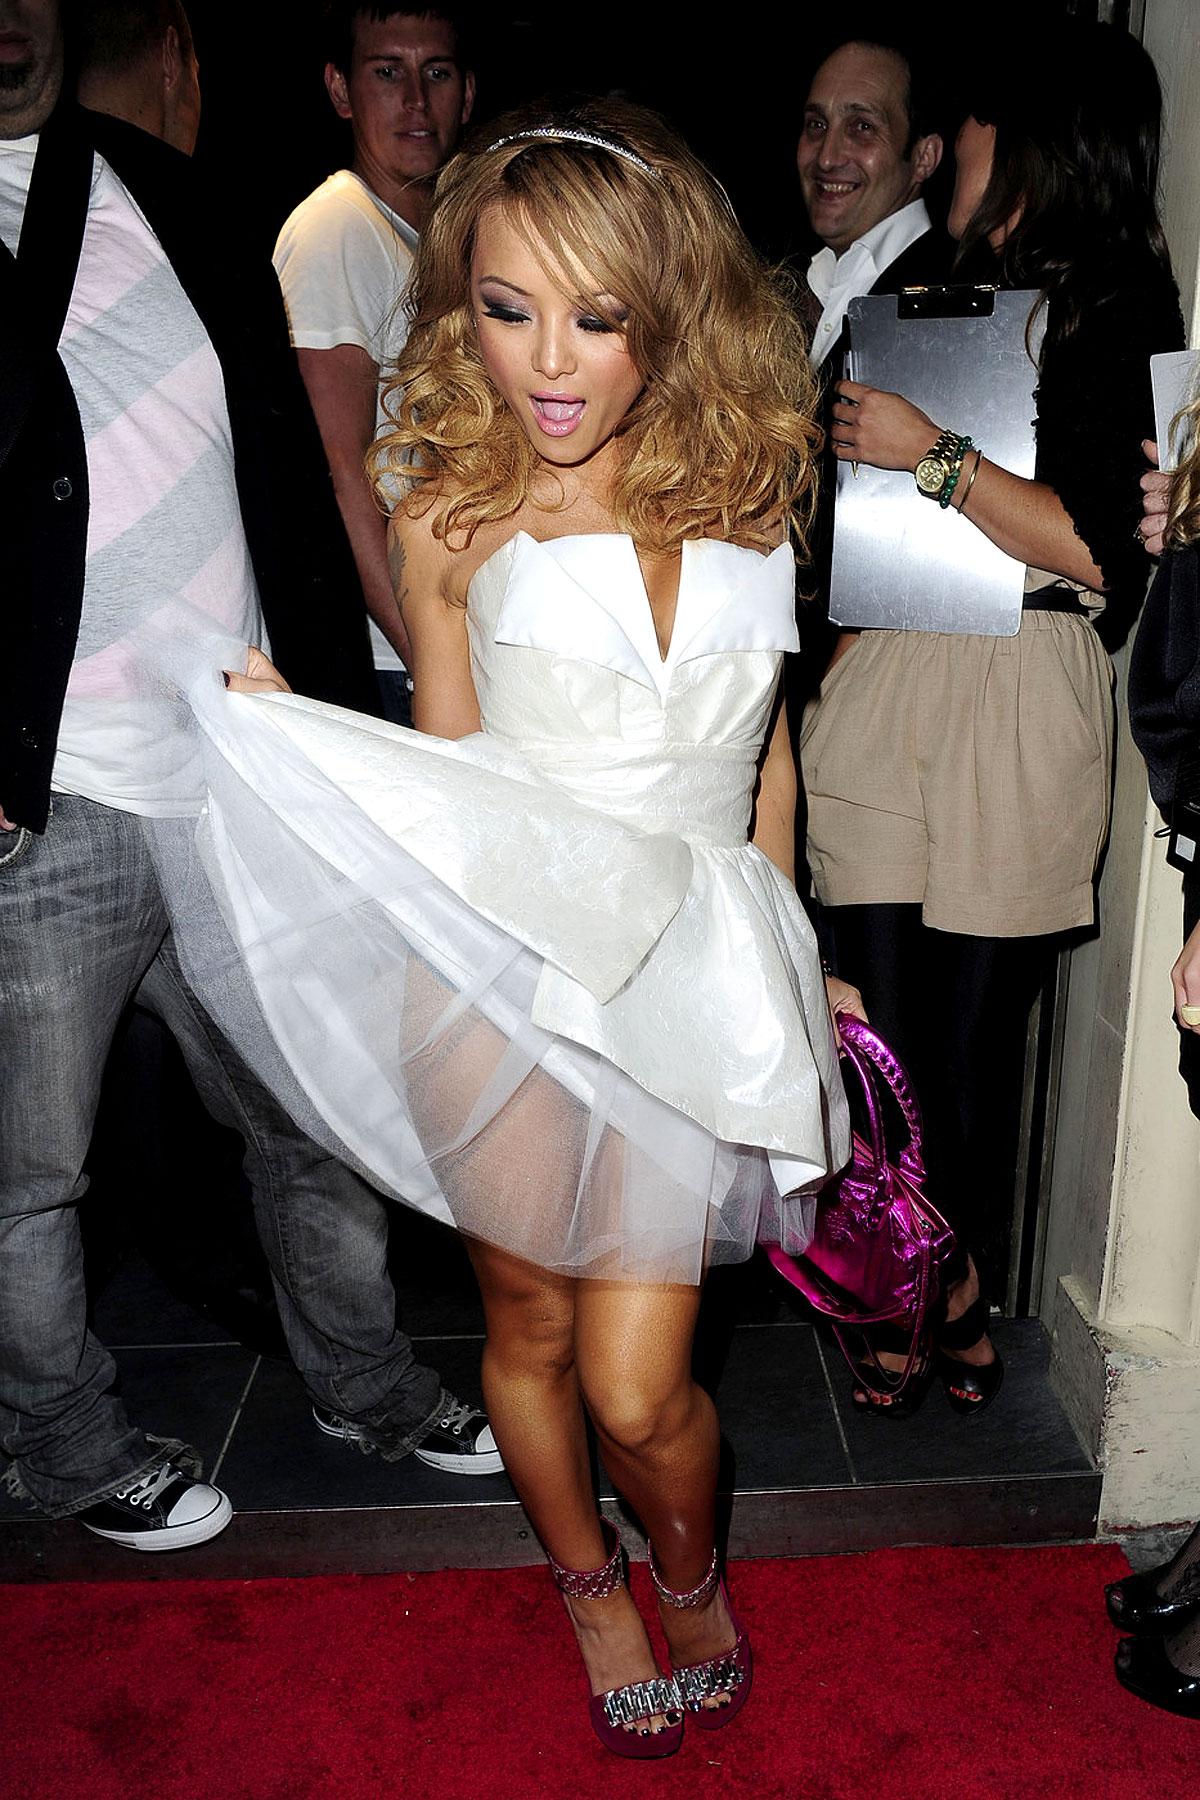 Tila Tequila Wears Princess Dress (PHOTOS)